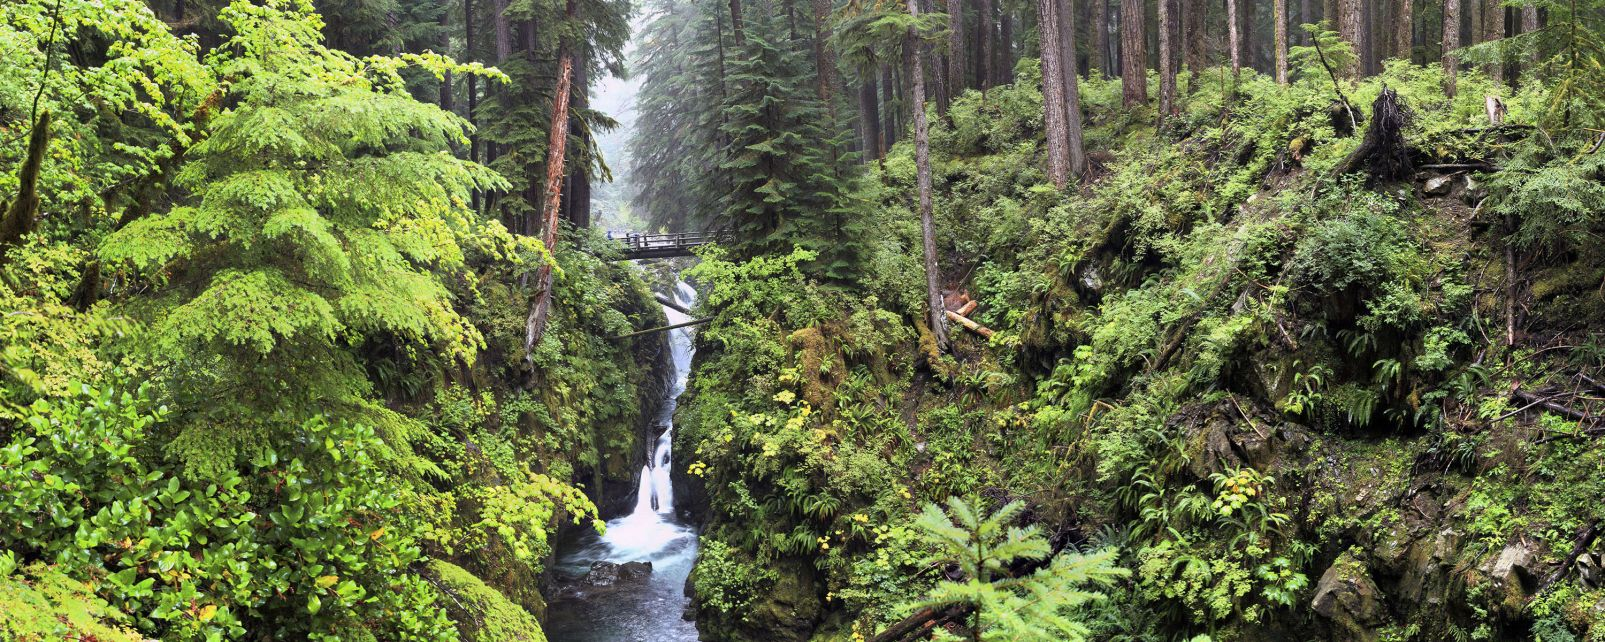 Les paysages, USA amerique etats-unis Olympic National Park parc Washington Olympic hoh.